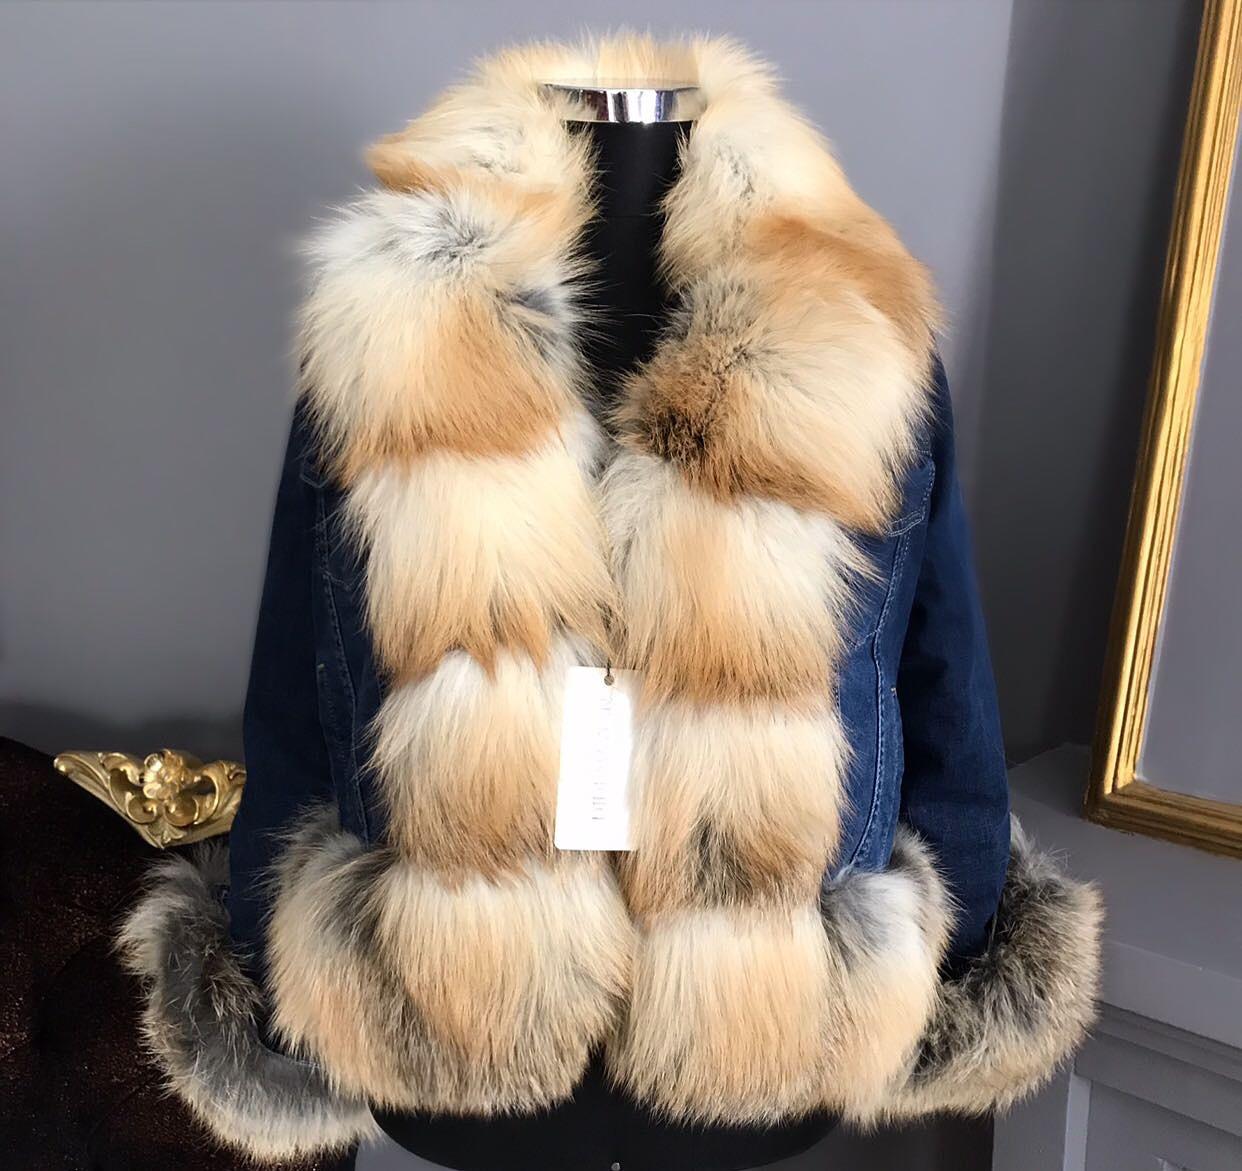 DIDEMΛYDIN Goldfox Fur Coat